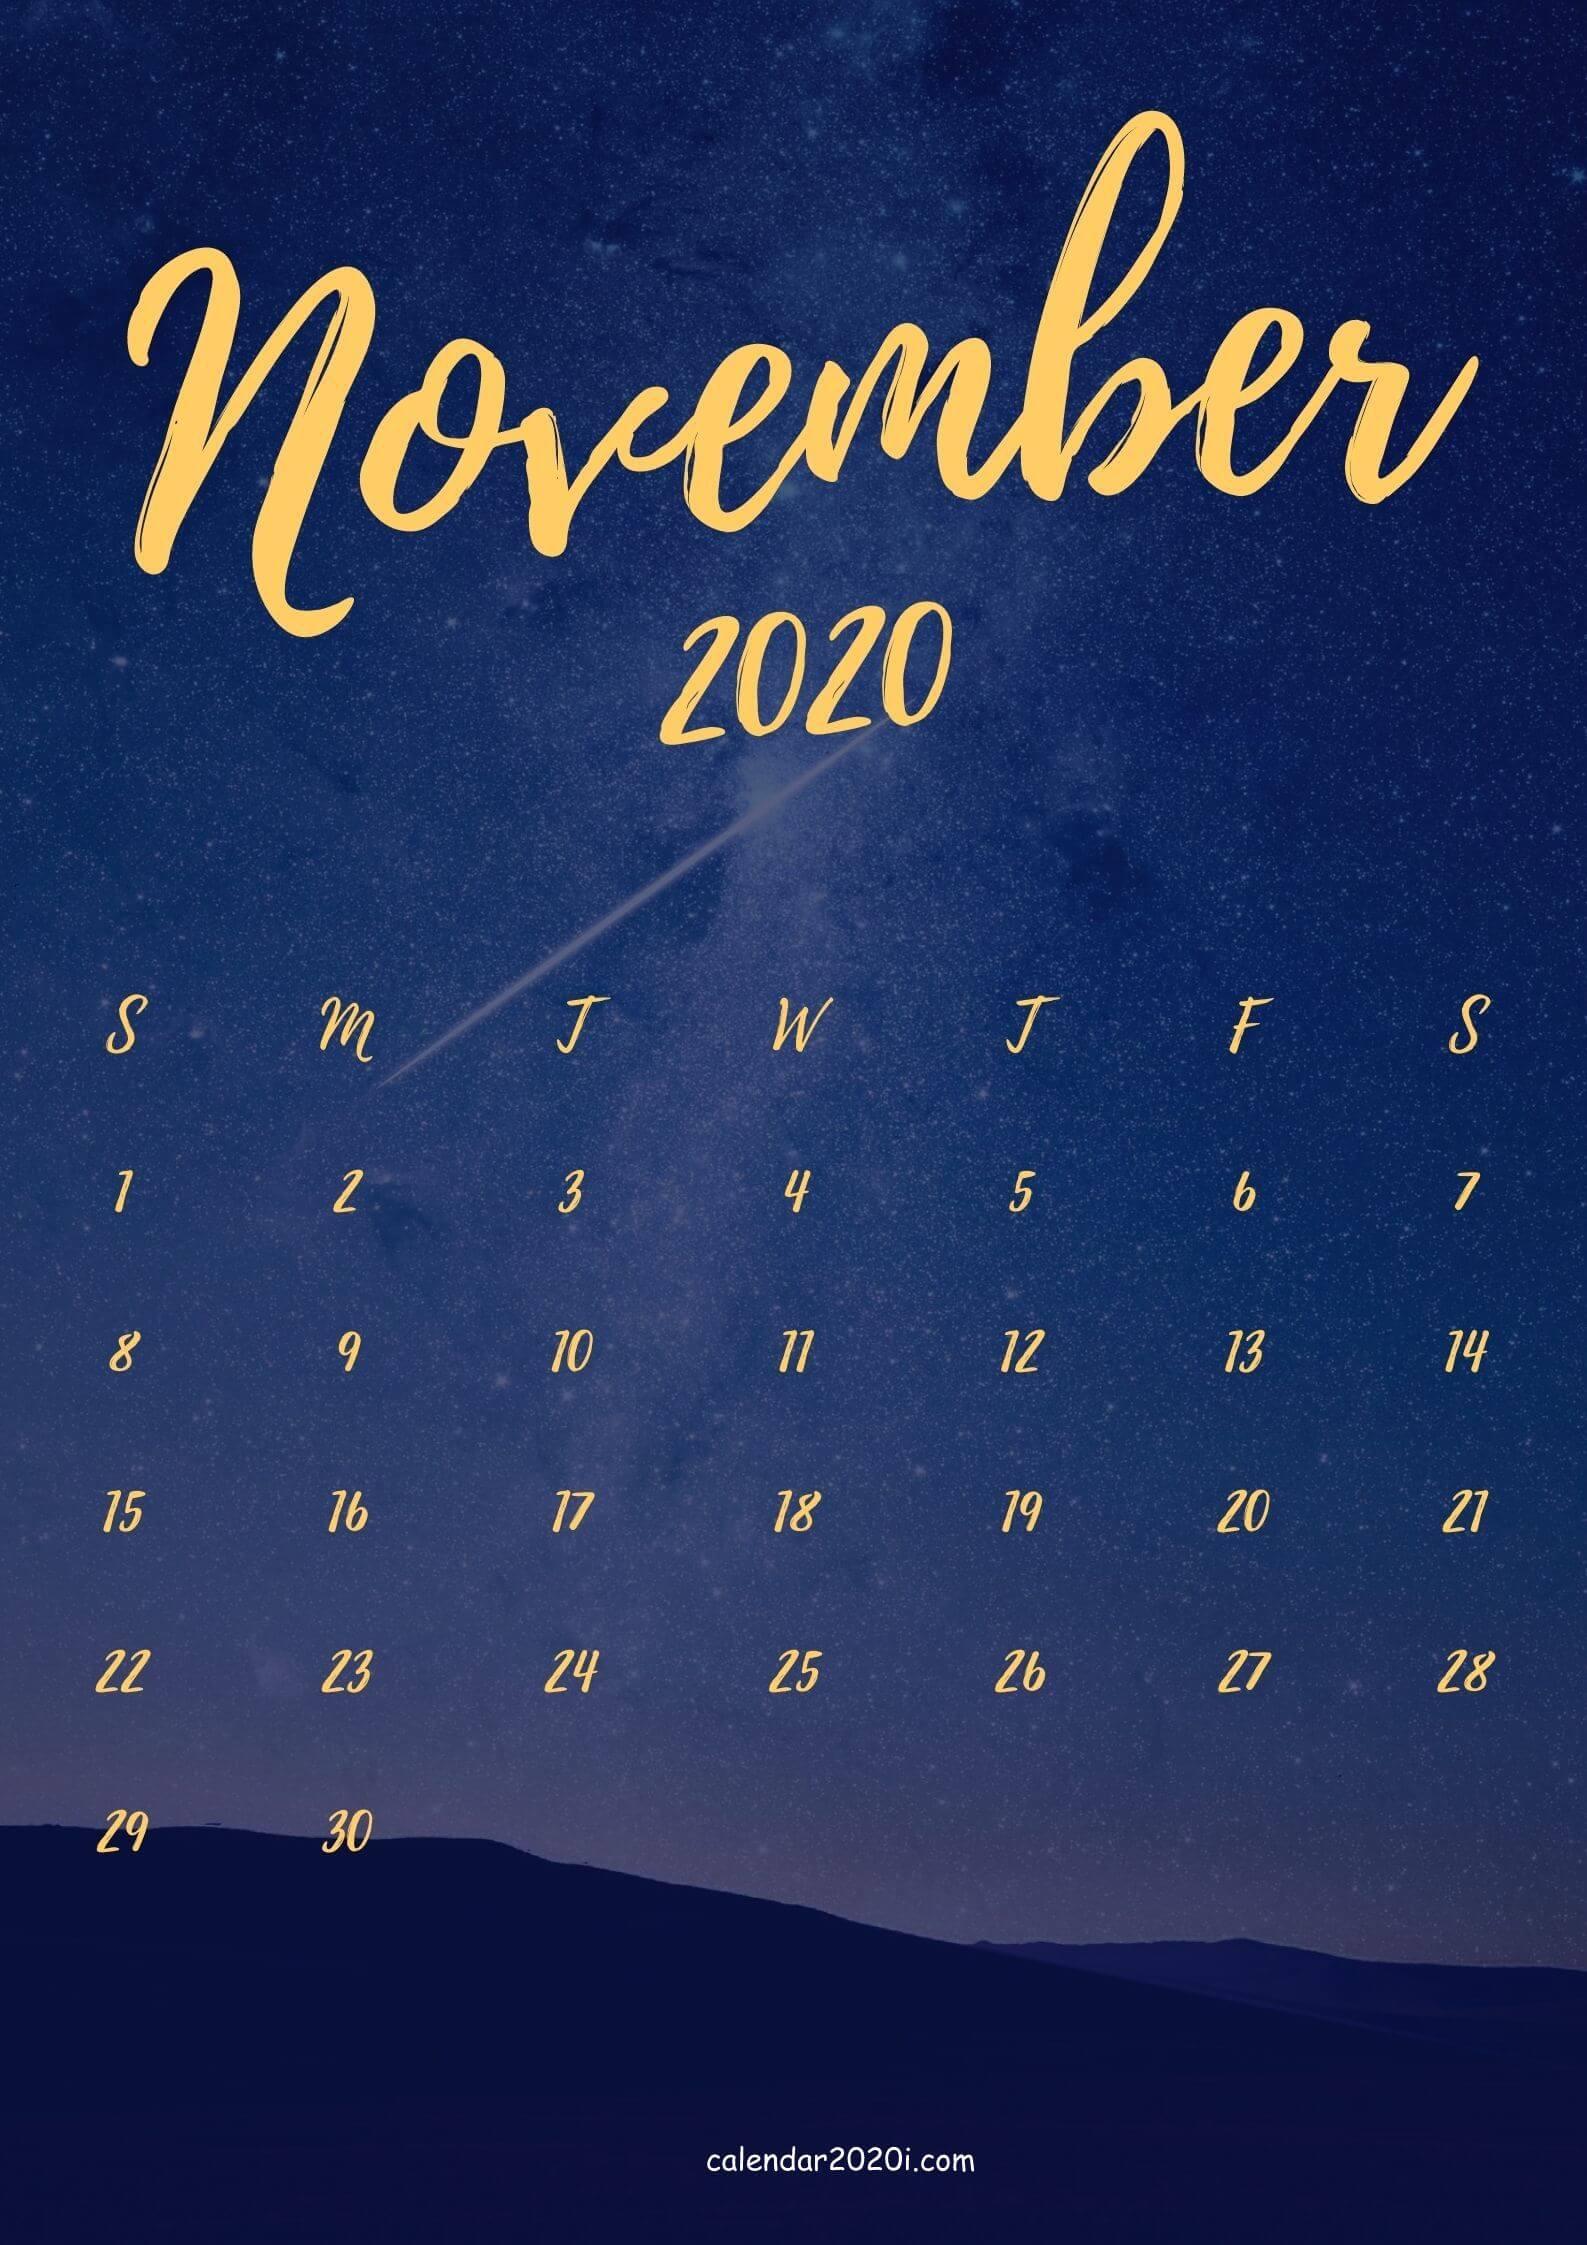 November 2020 iPhone Calendar Wallpaper